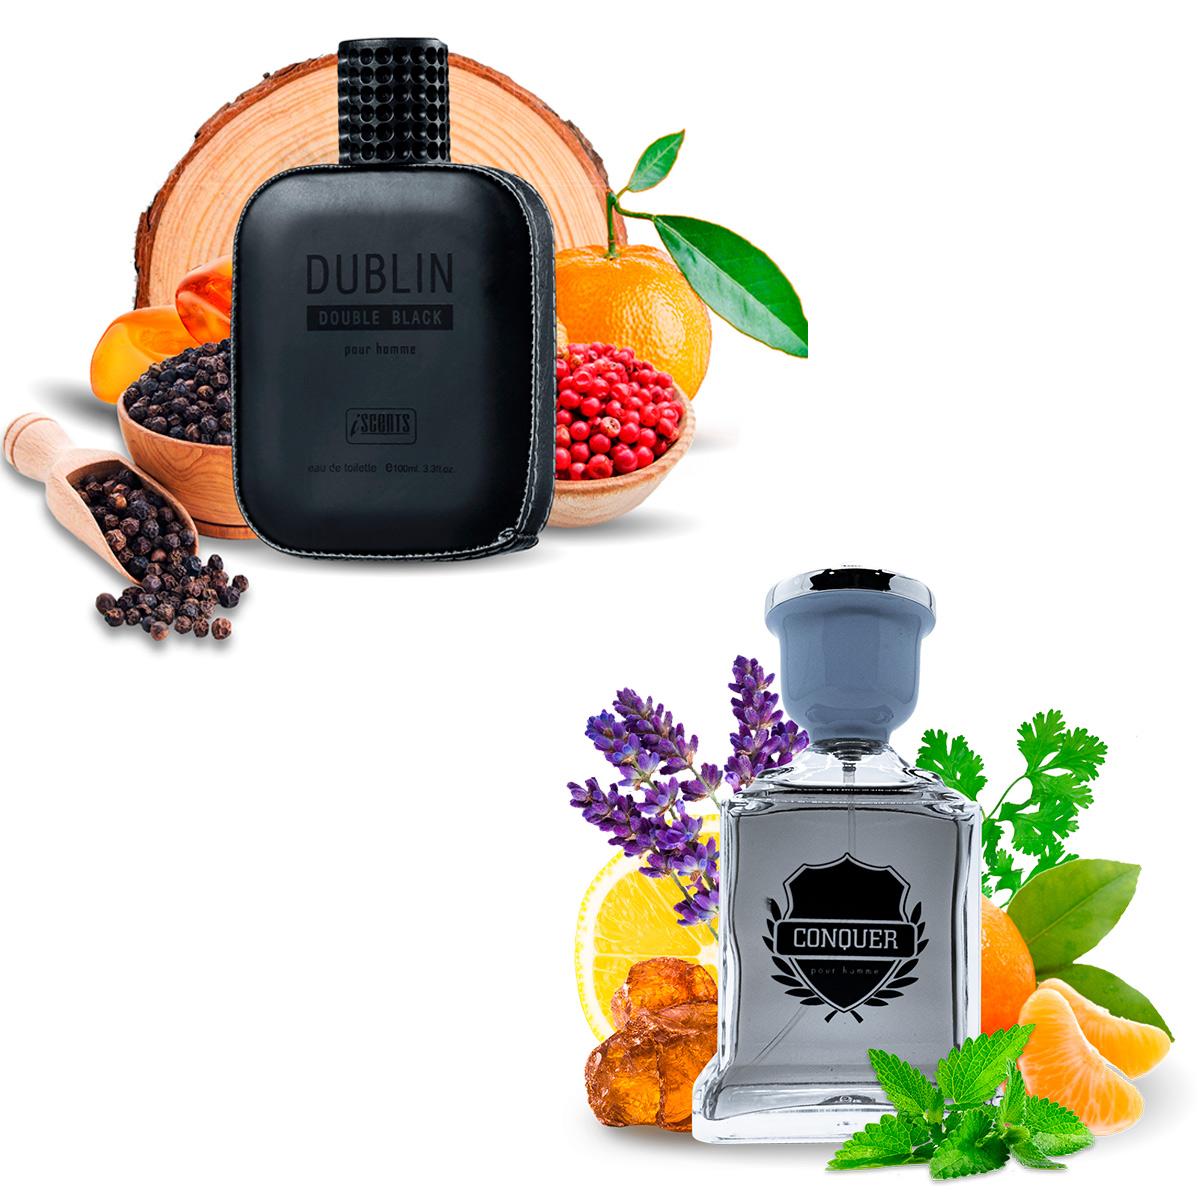 Kit 2 Perfumes Importados Dublin e Conquer I Scents